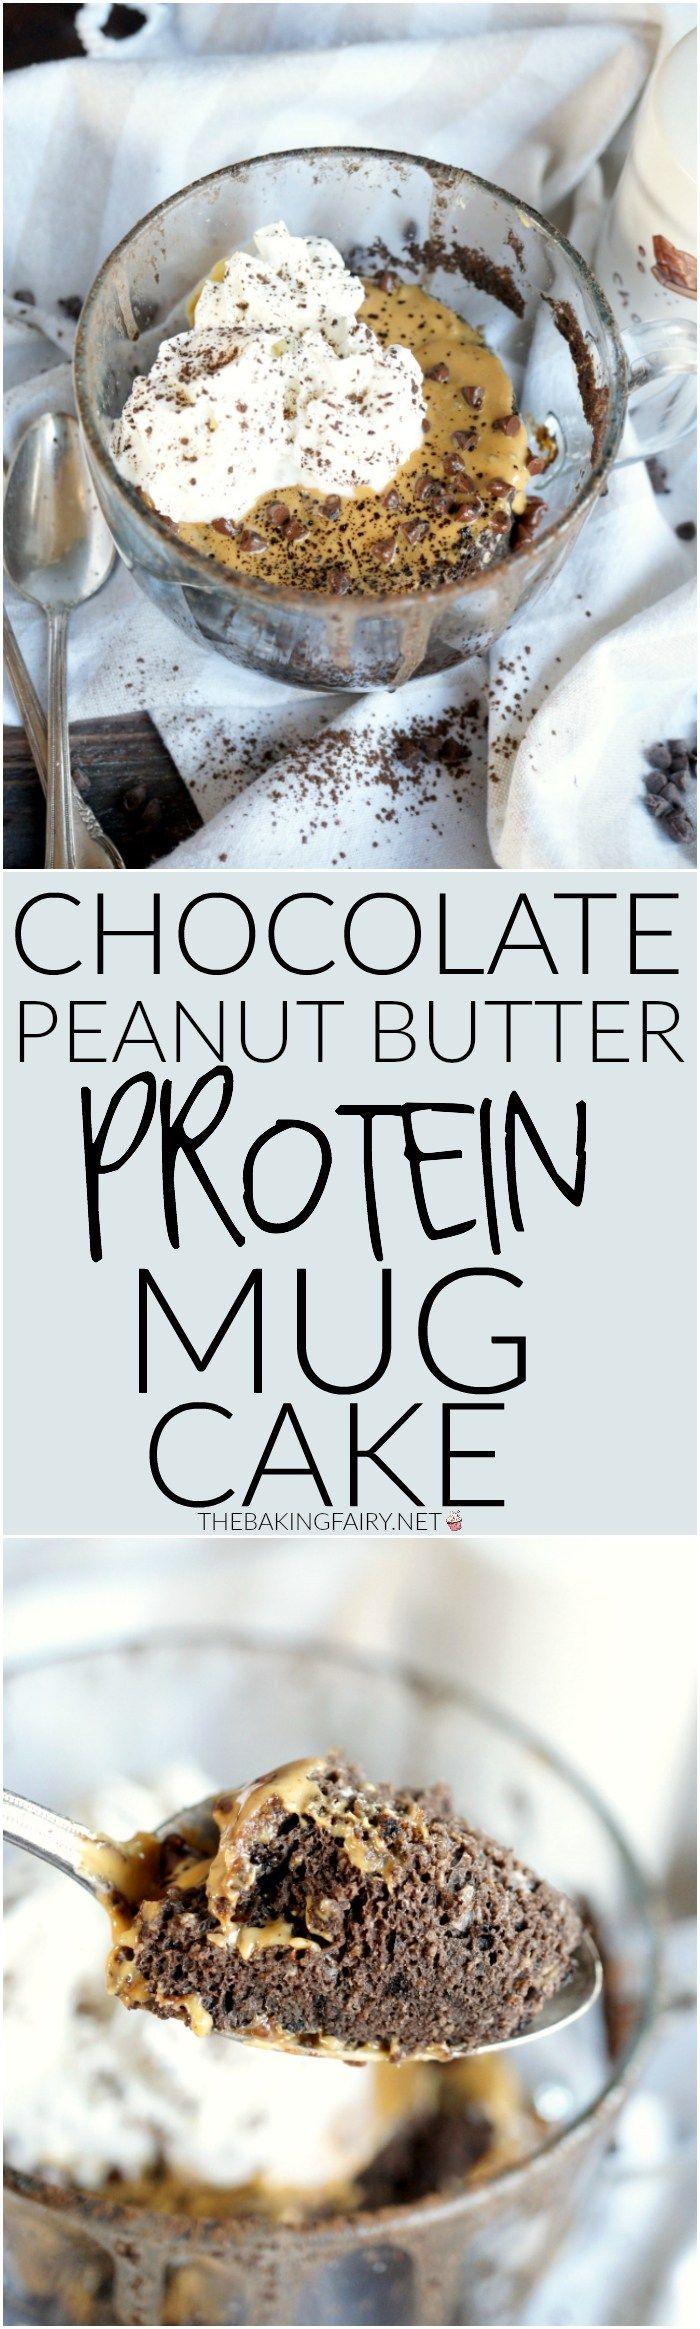 chocolate peanut butter protein mug cake | The Baking Fairy